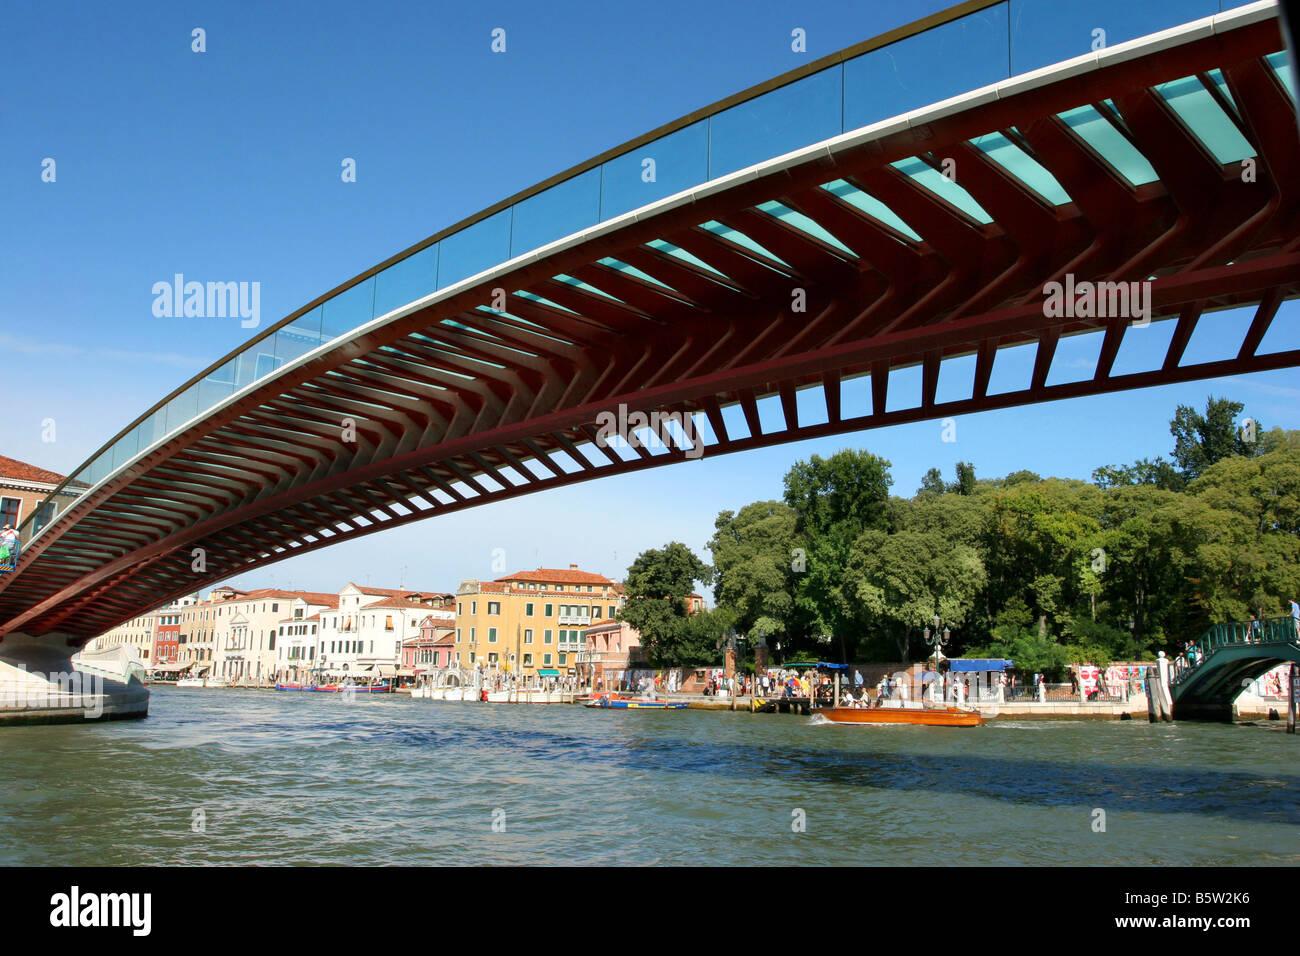 calatrava bridge venice photos - photo#19